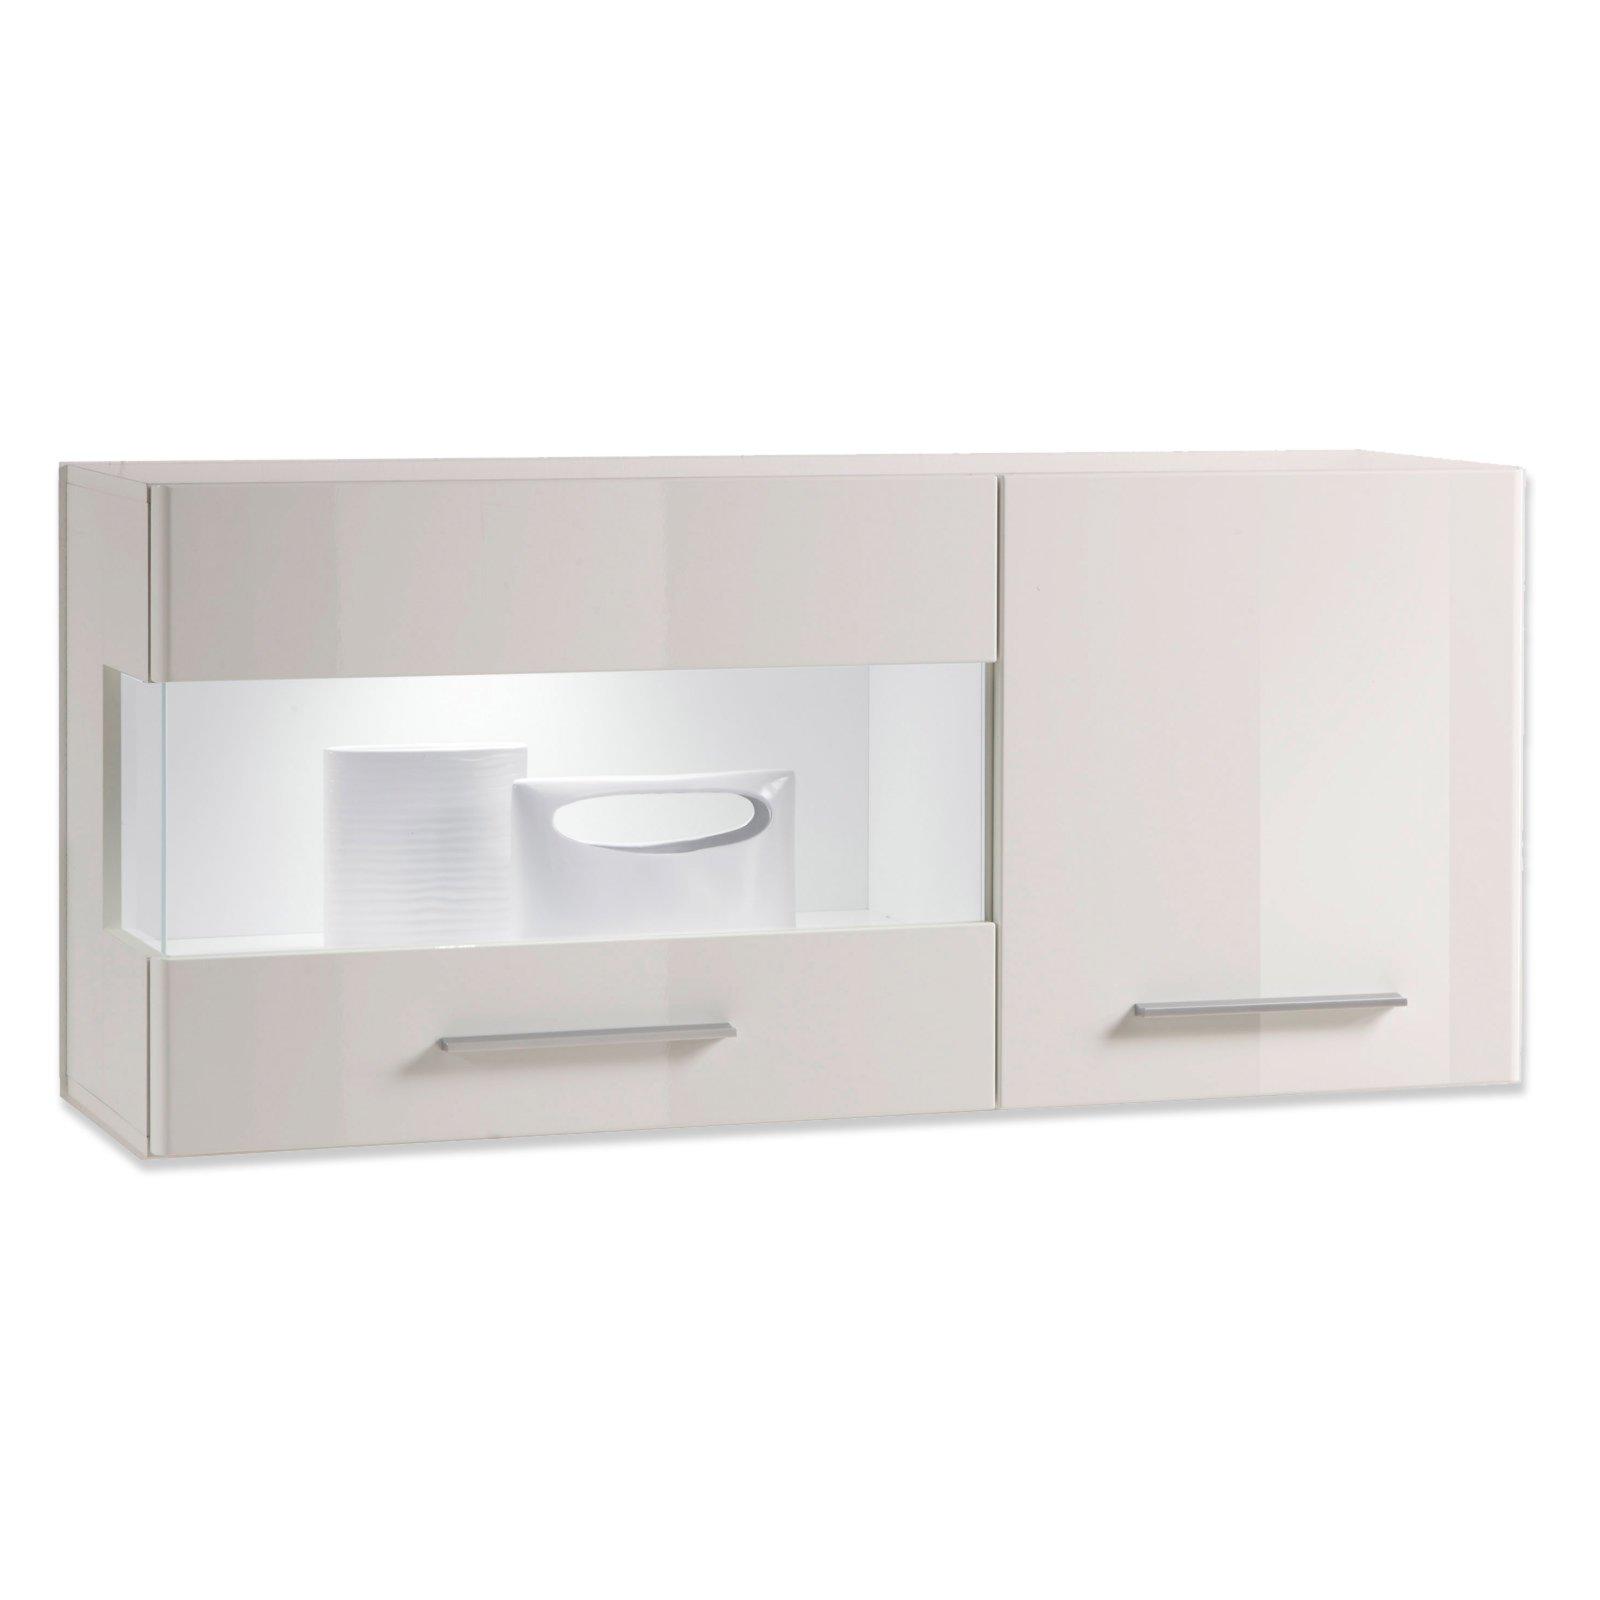 h ngevitrine shine wei hochglanz vitrinen m bel. Black Bedroom Furniture Sets. Home Design Ideas